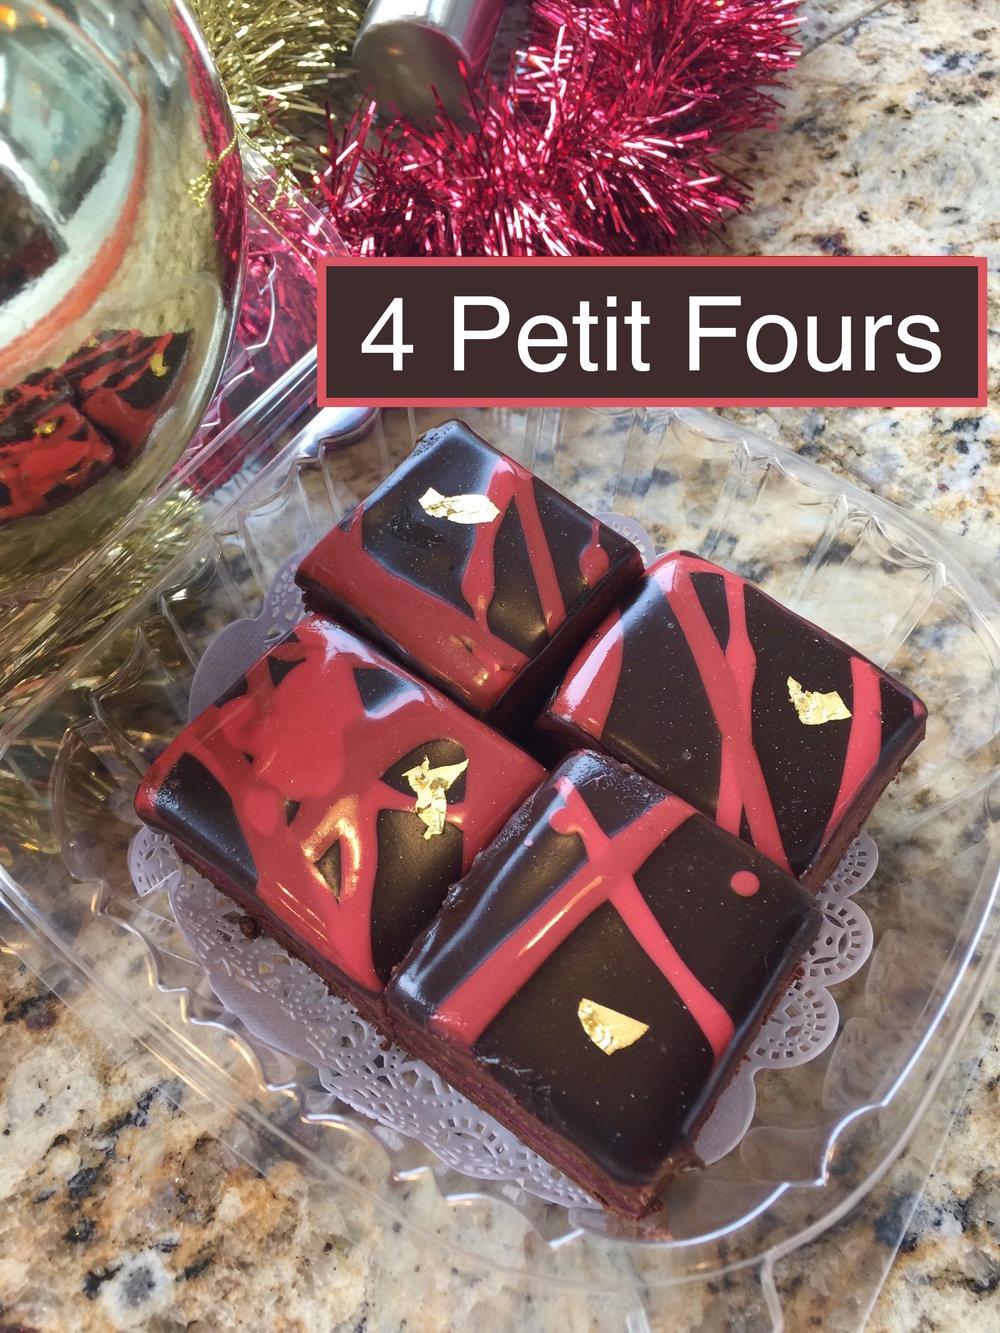 4 Petit Fours.jpg